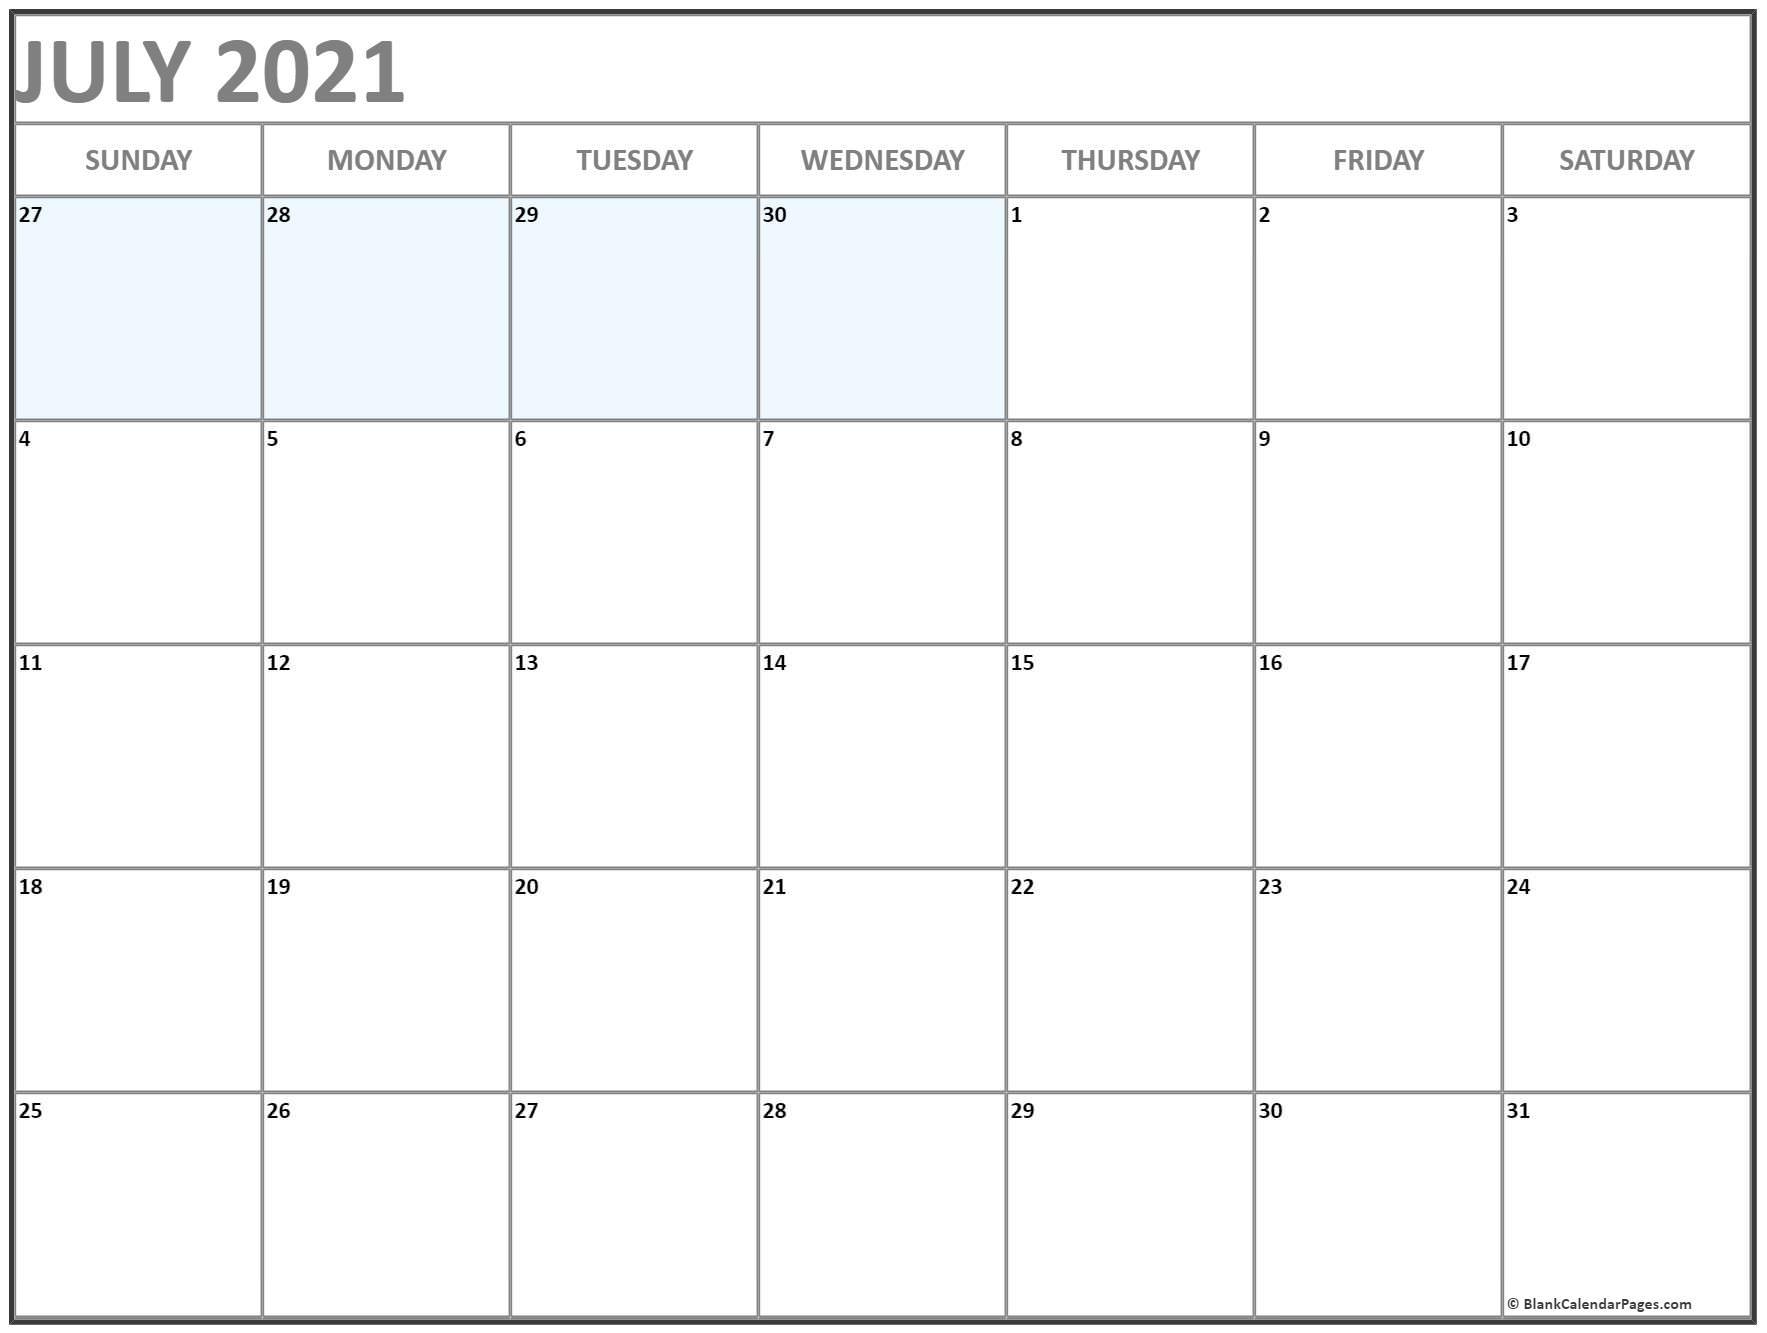 July 2021 Blank Calendar Templates. Blank July 2021 Calendar Printable